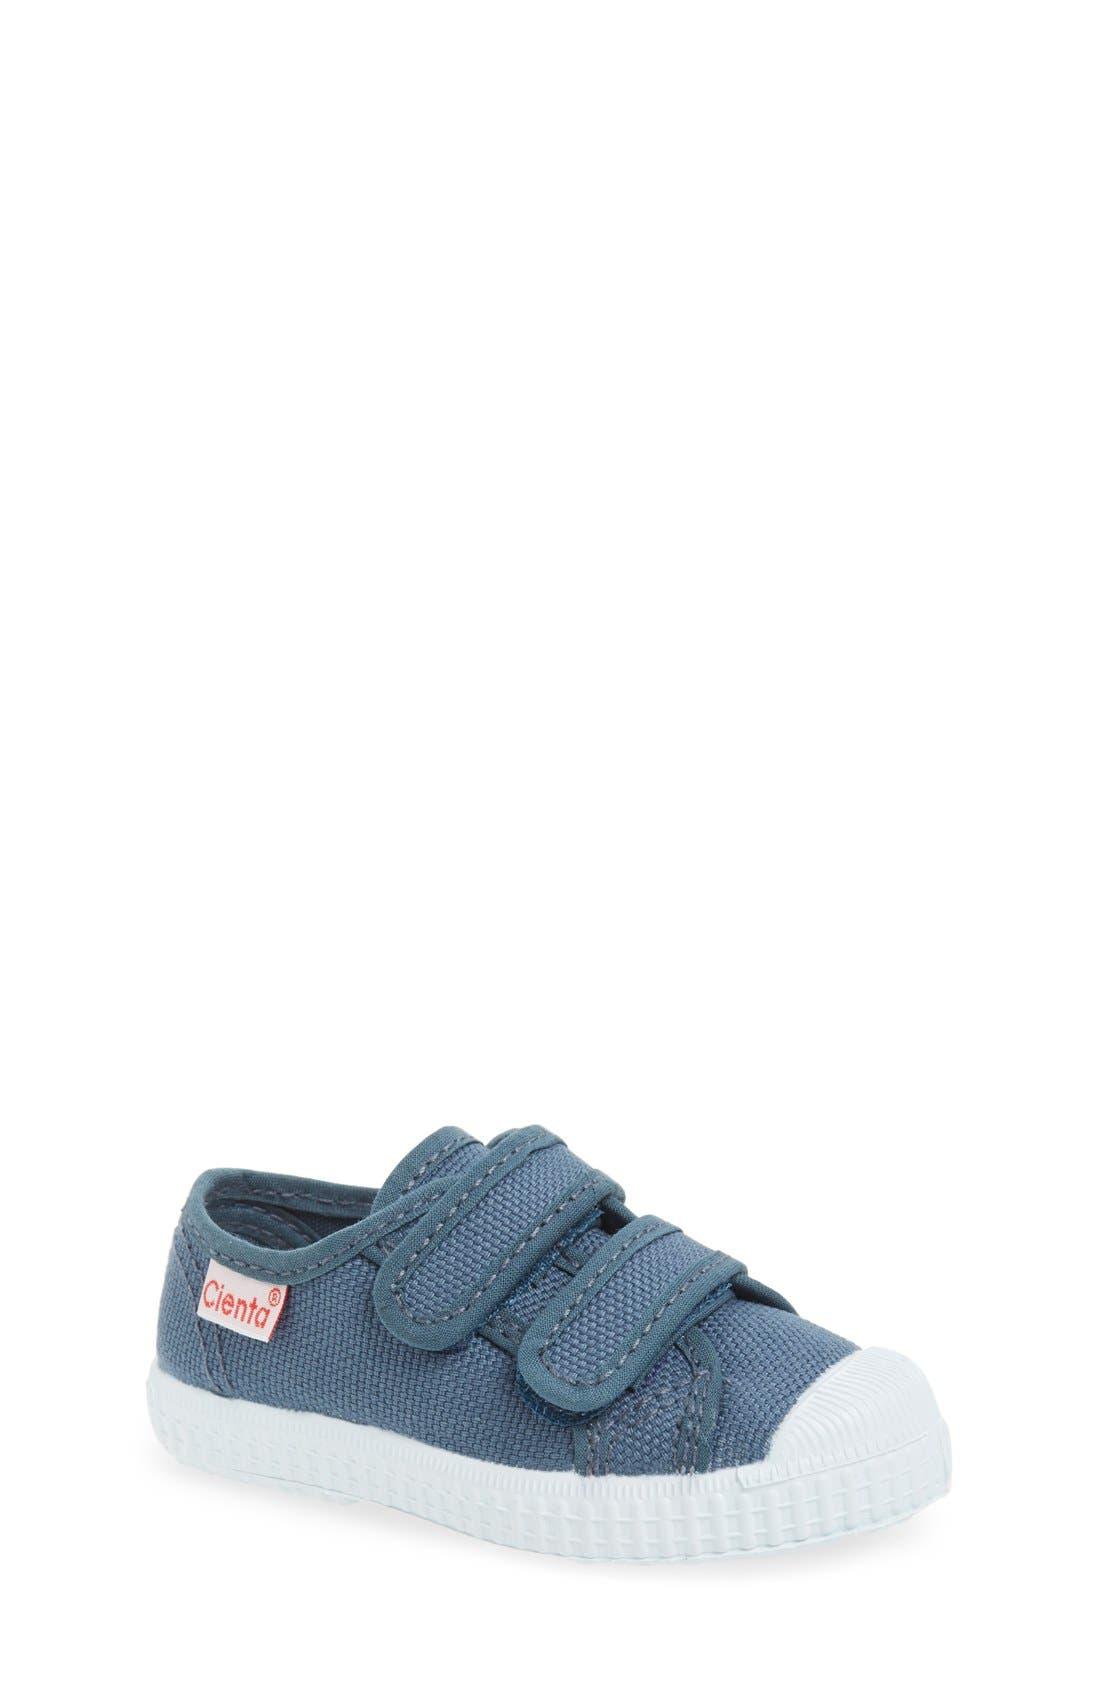 Canvas Sneaker,                             Main thumbnail 1, color,                             Grey